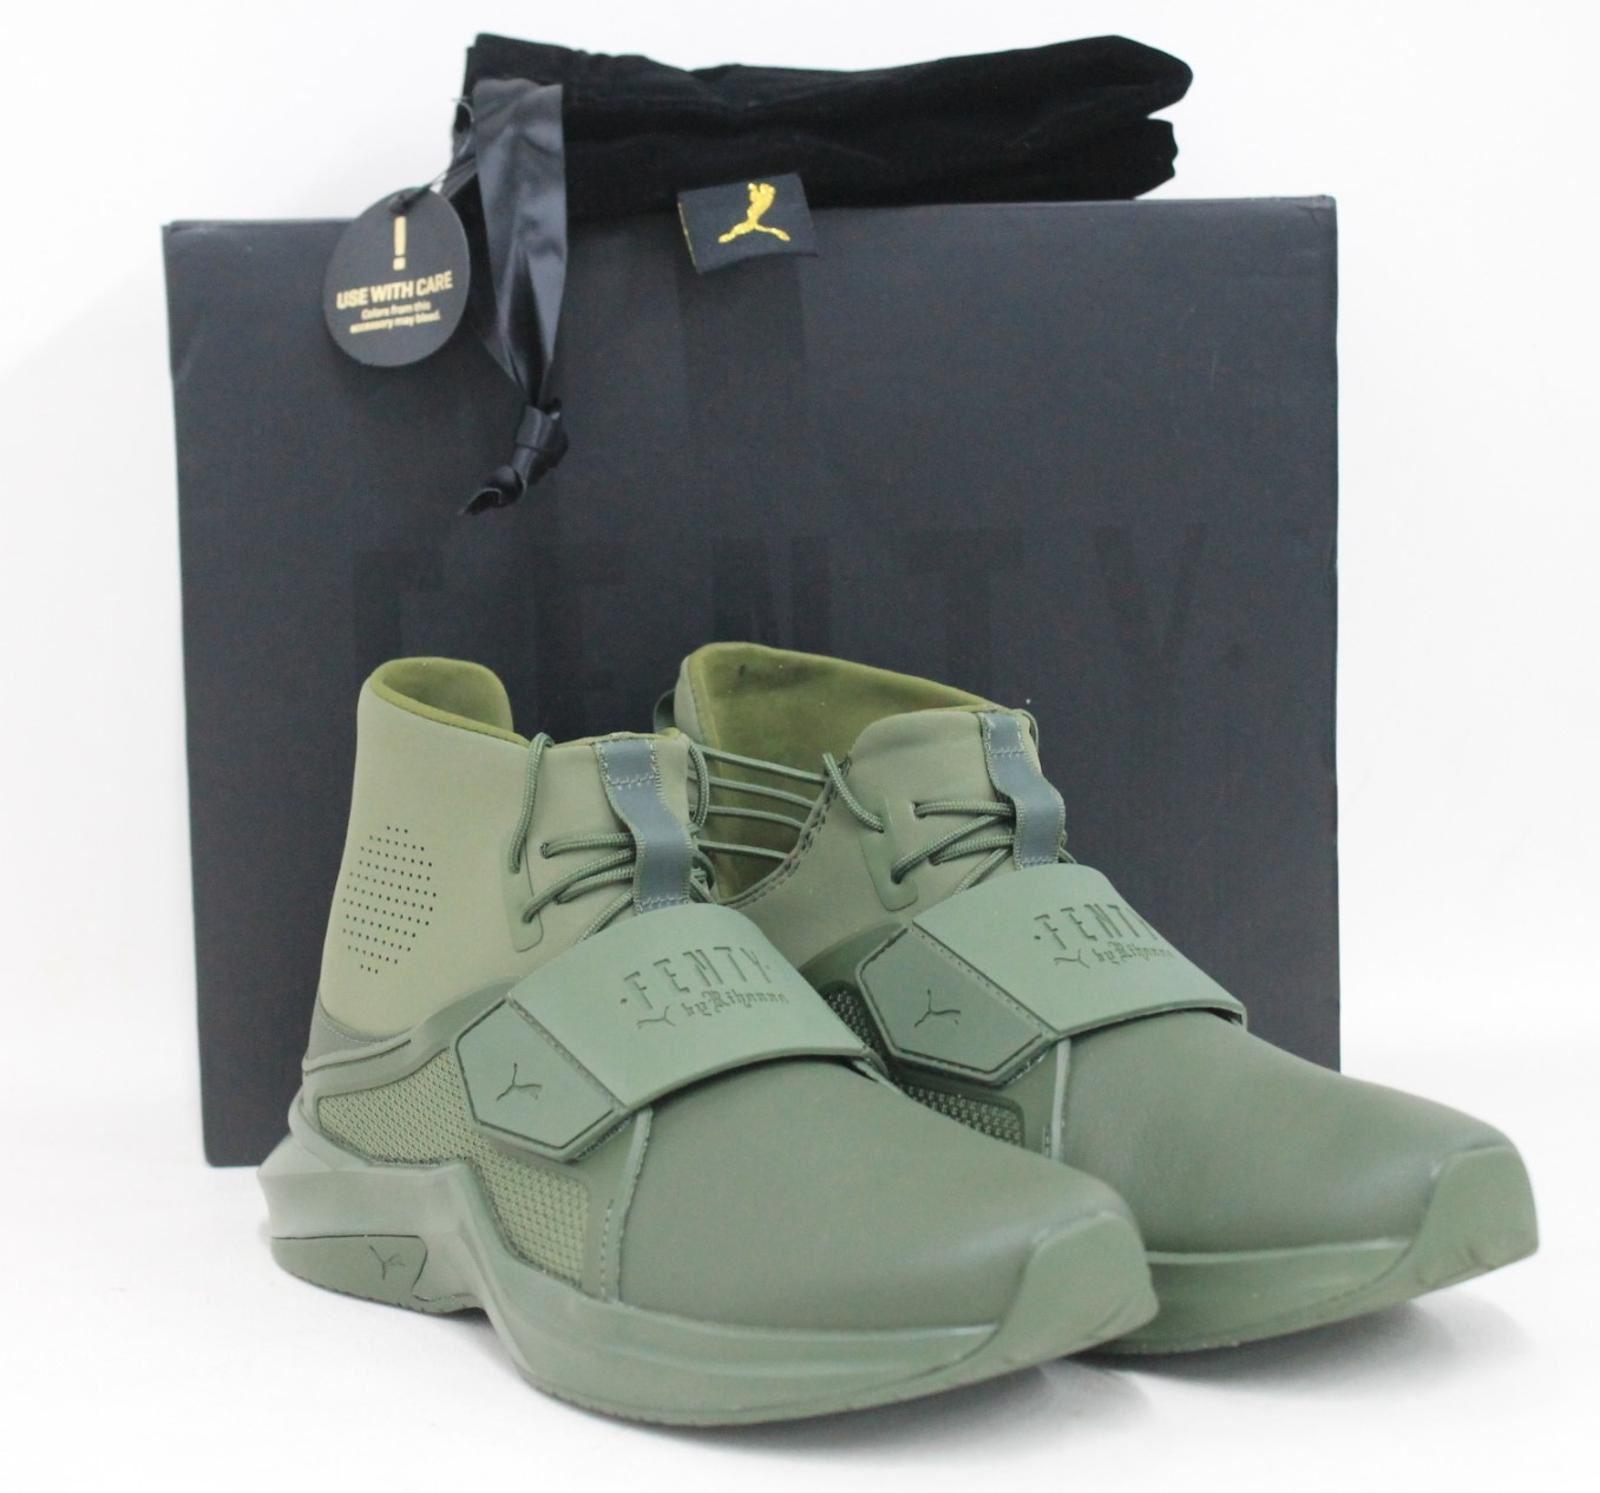 BNIB PUMA Ladies The The The Trainer Hi By Fenty Green shoes Trainers Size UK6.5 EU40 d52f2d